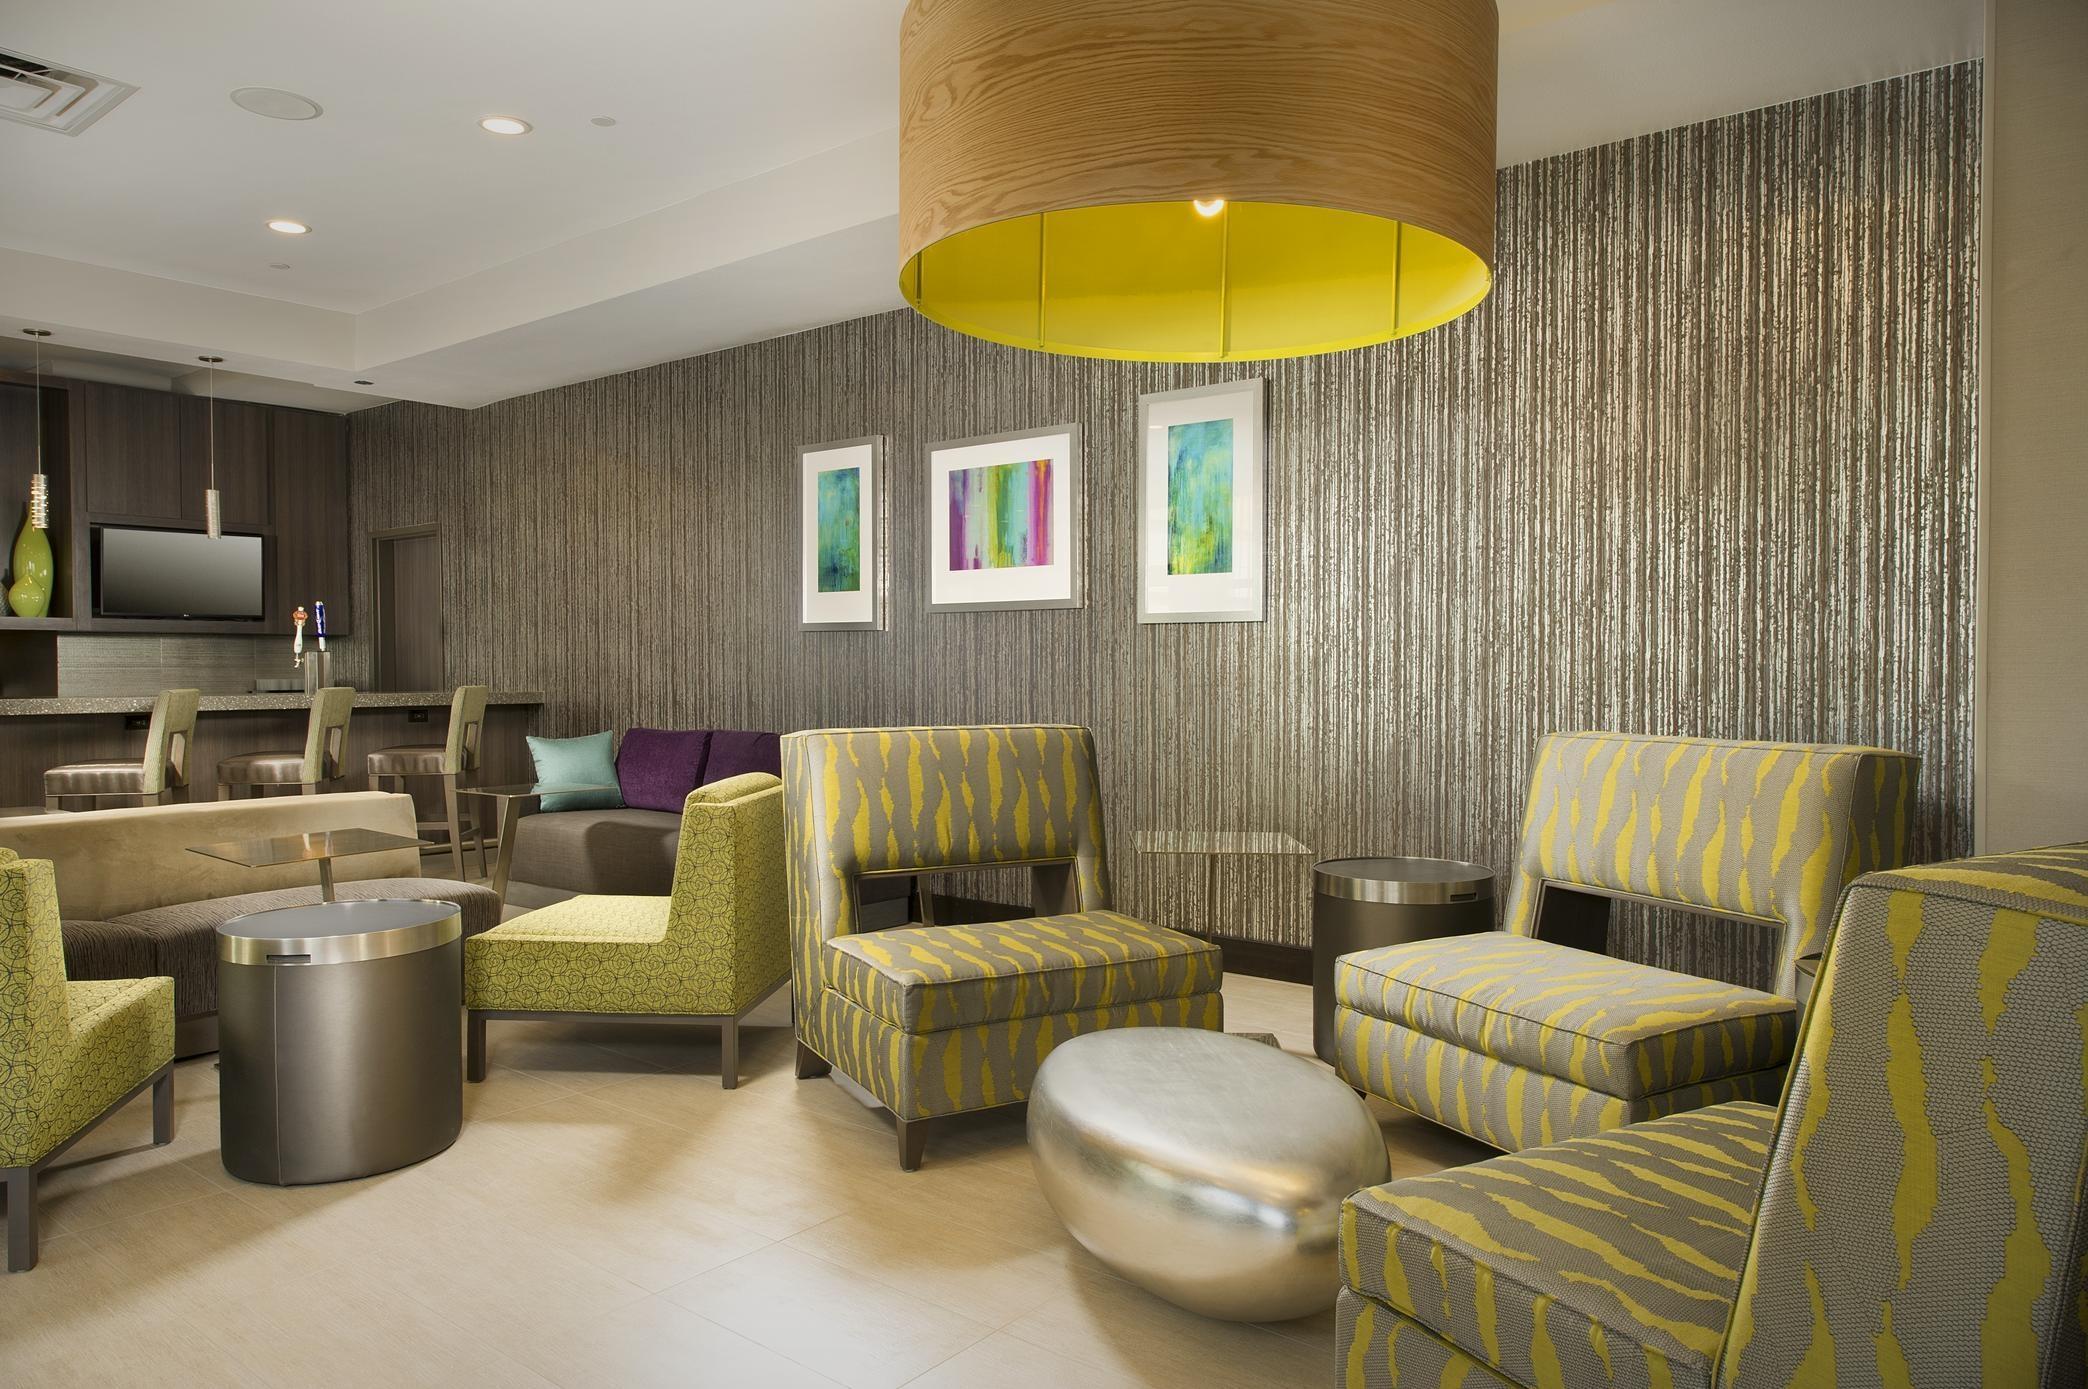 Hilton Garden Inn College Station image 9